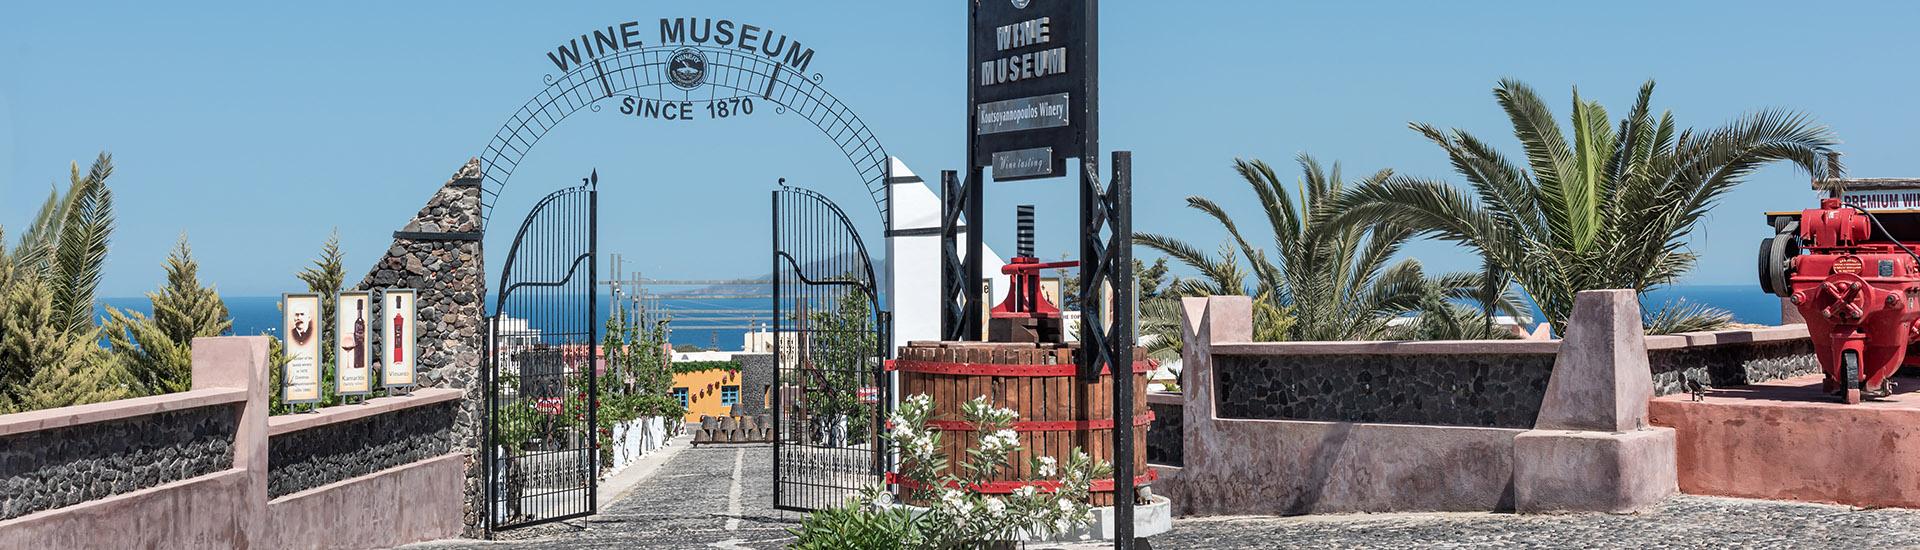 wine-museum-slide-03